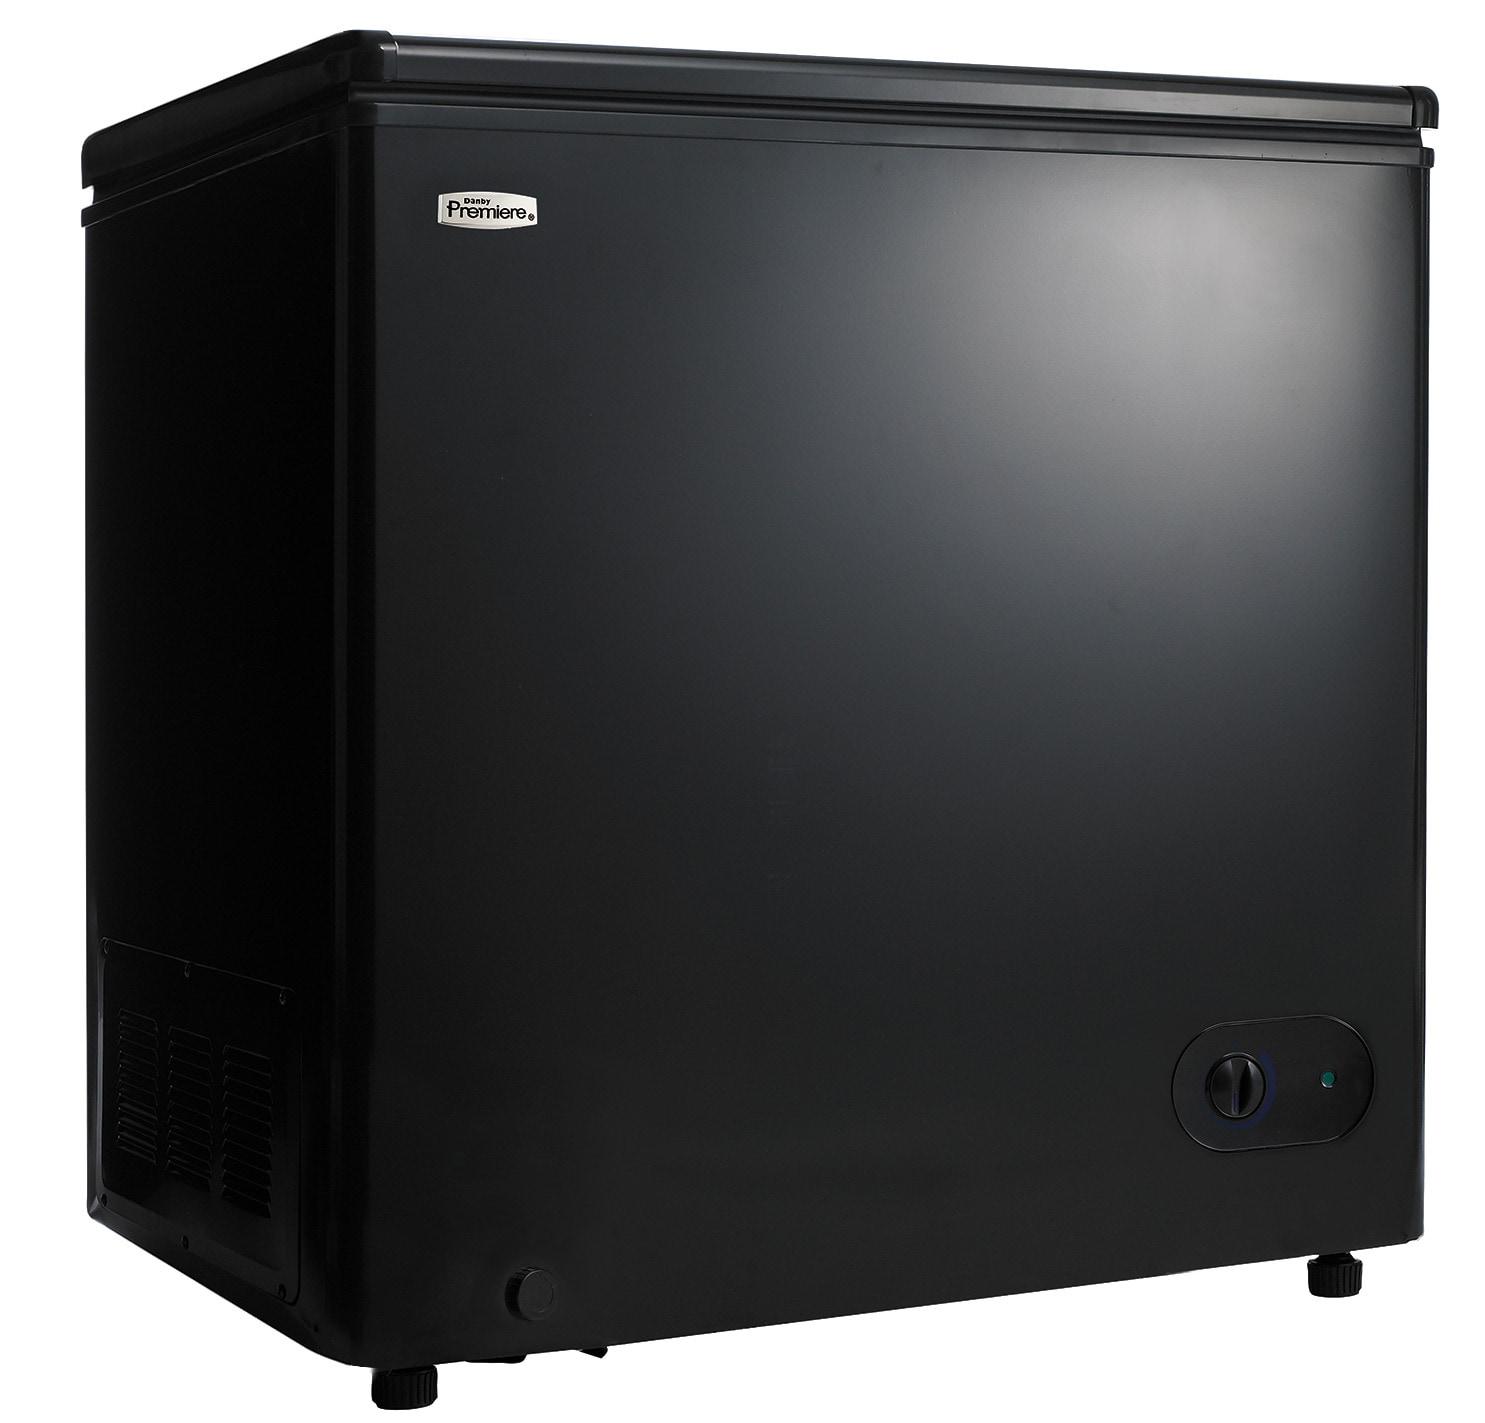 danby black chest freezer 5 5 cu ft dcf055a1bp leon 39 s. Black Bedroom Furniture Sets. Home Design Ideas